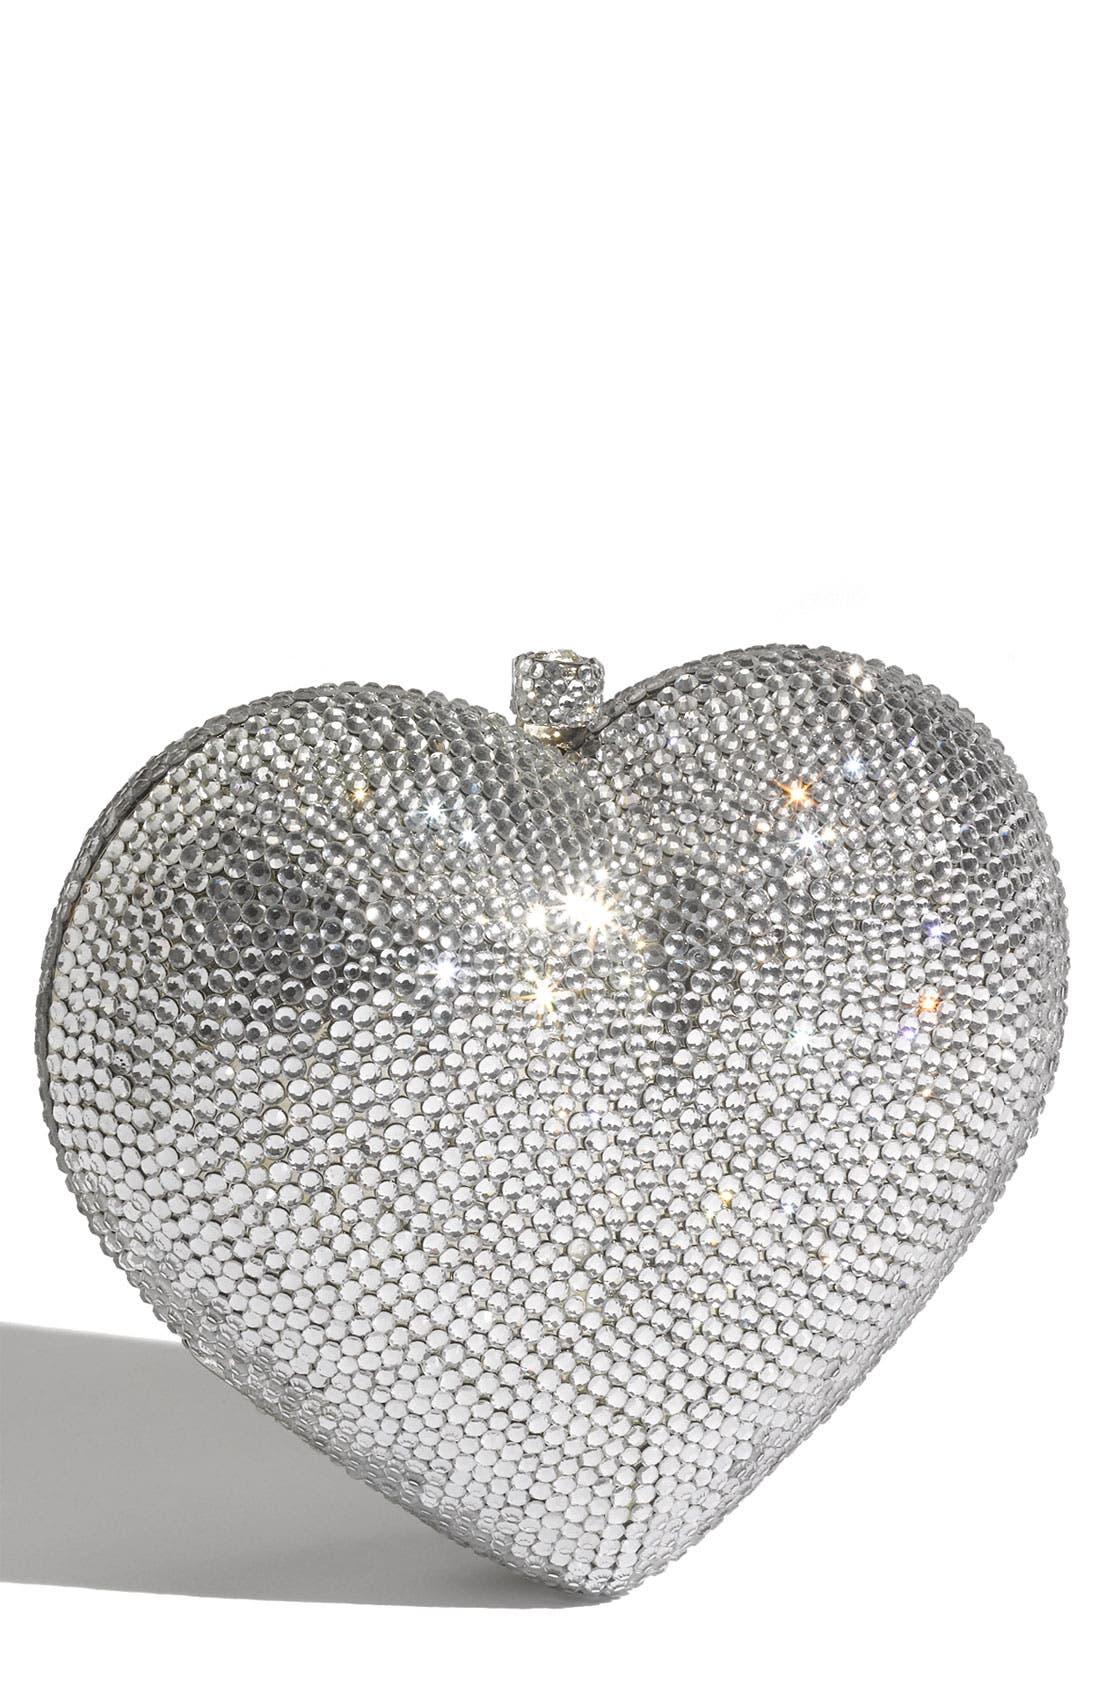 Alternate Image 1 Selected - Tasha 'Heart' Clutch